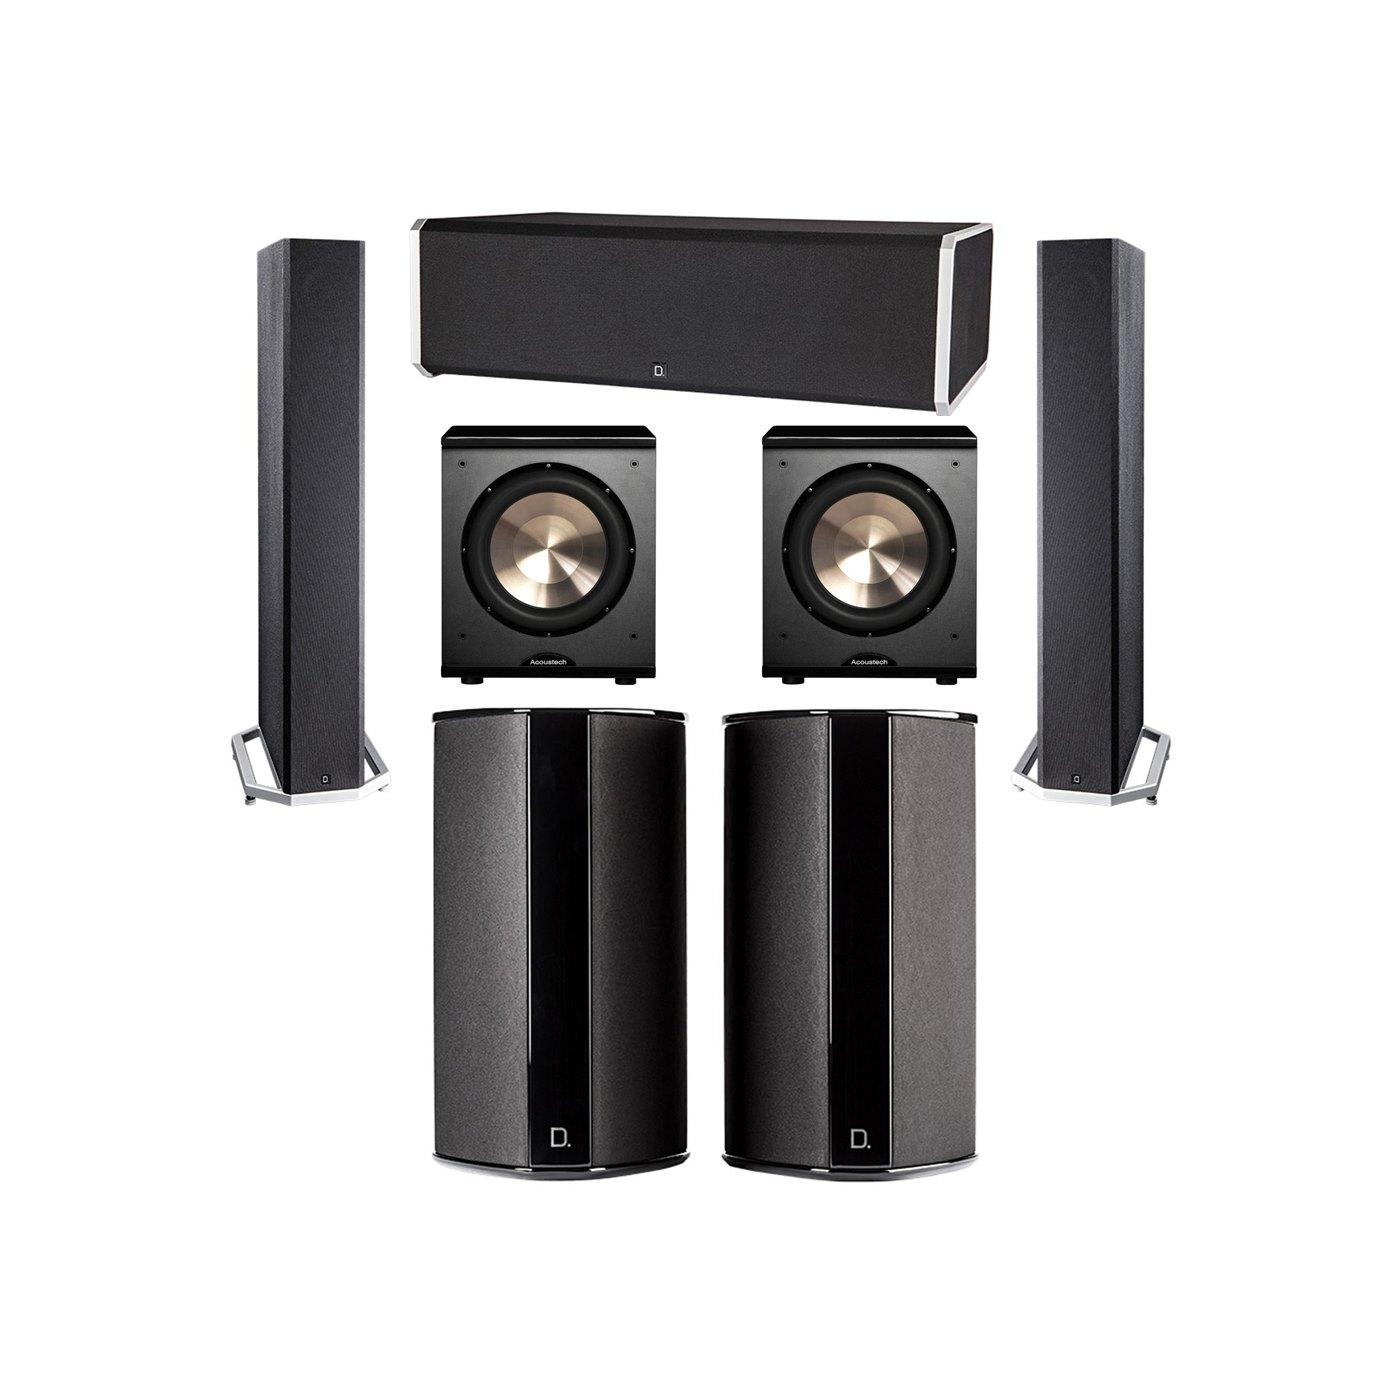 Definitive Technology 5.2 System with 2 BP9040 Tower Speakers, 1 CS9080 Center Channel Speaker, 2 SR9080 Surround Speaker, 2 BIC PL-200 Subwoofer